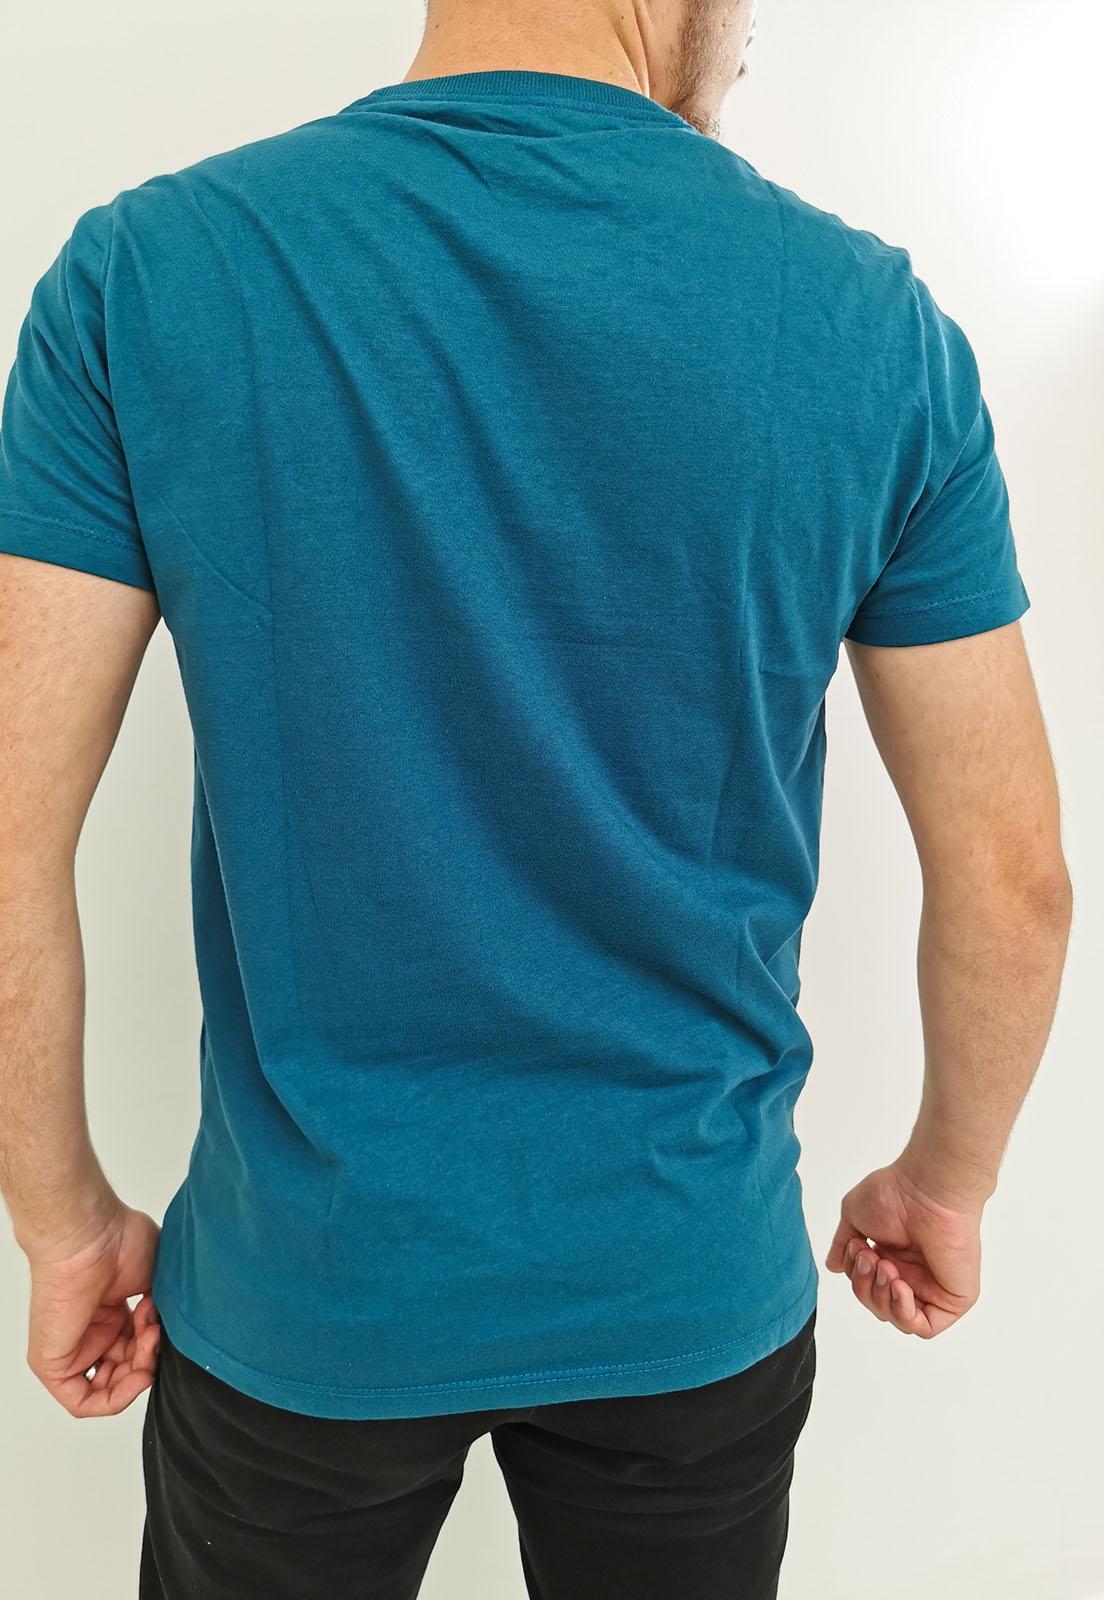 Camiseta Arandom Azul Petróleo Básica